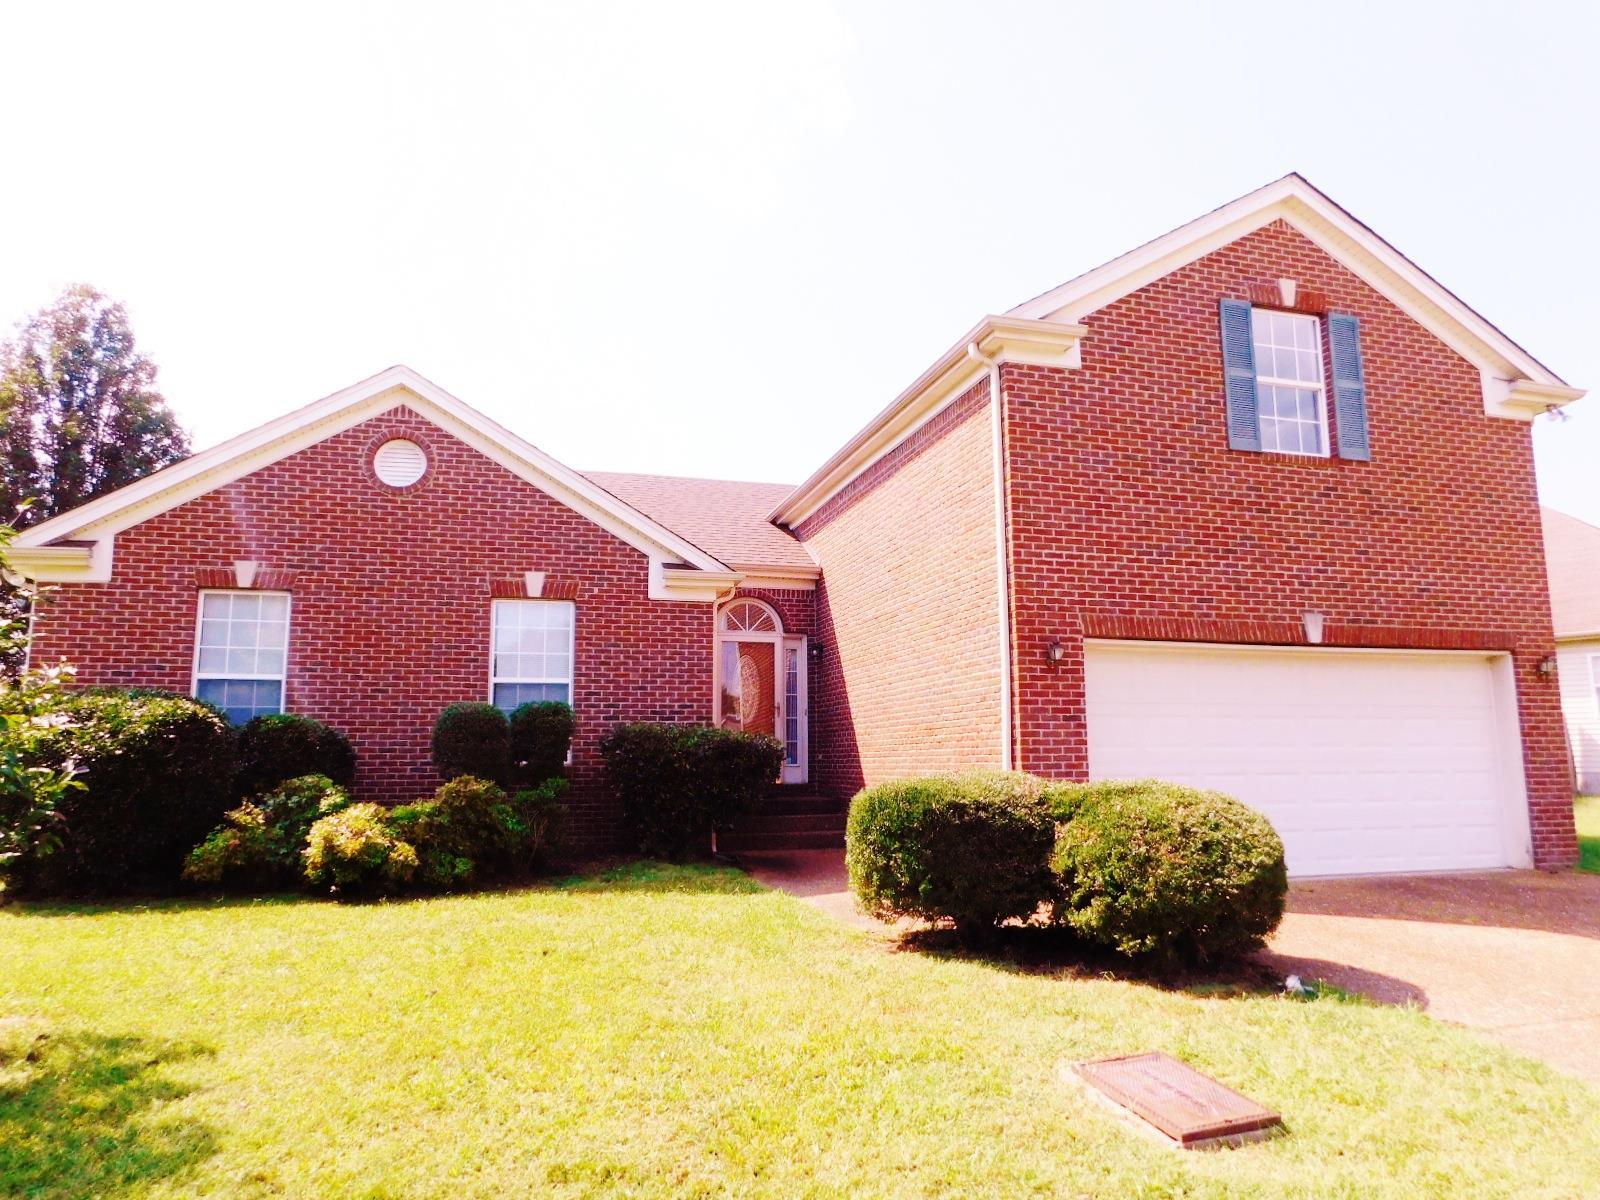 205 Baylee Mika Pl, Joelton, TN 37080 - Joelton, TN real estate listing